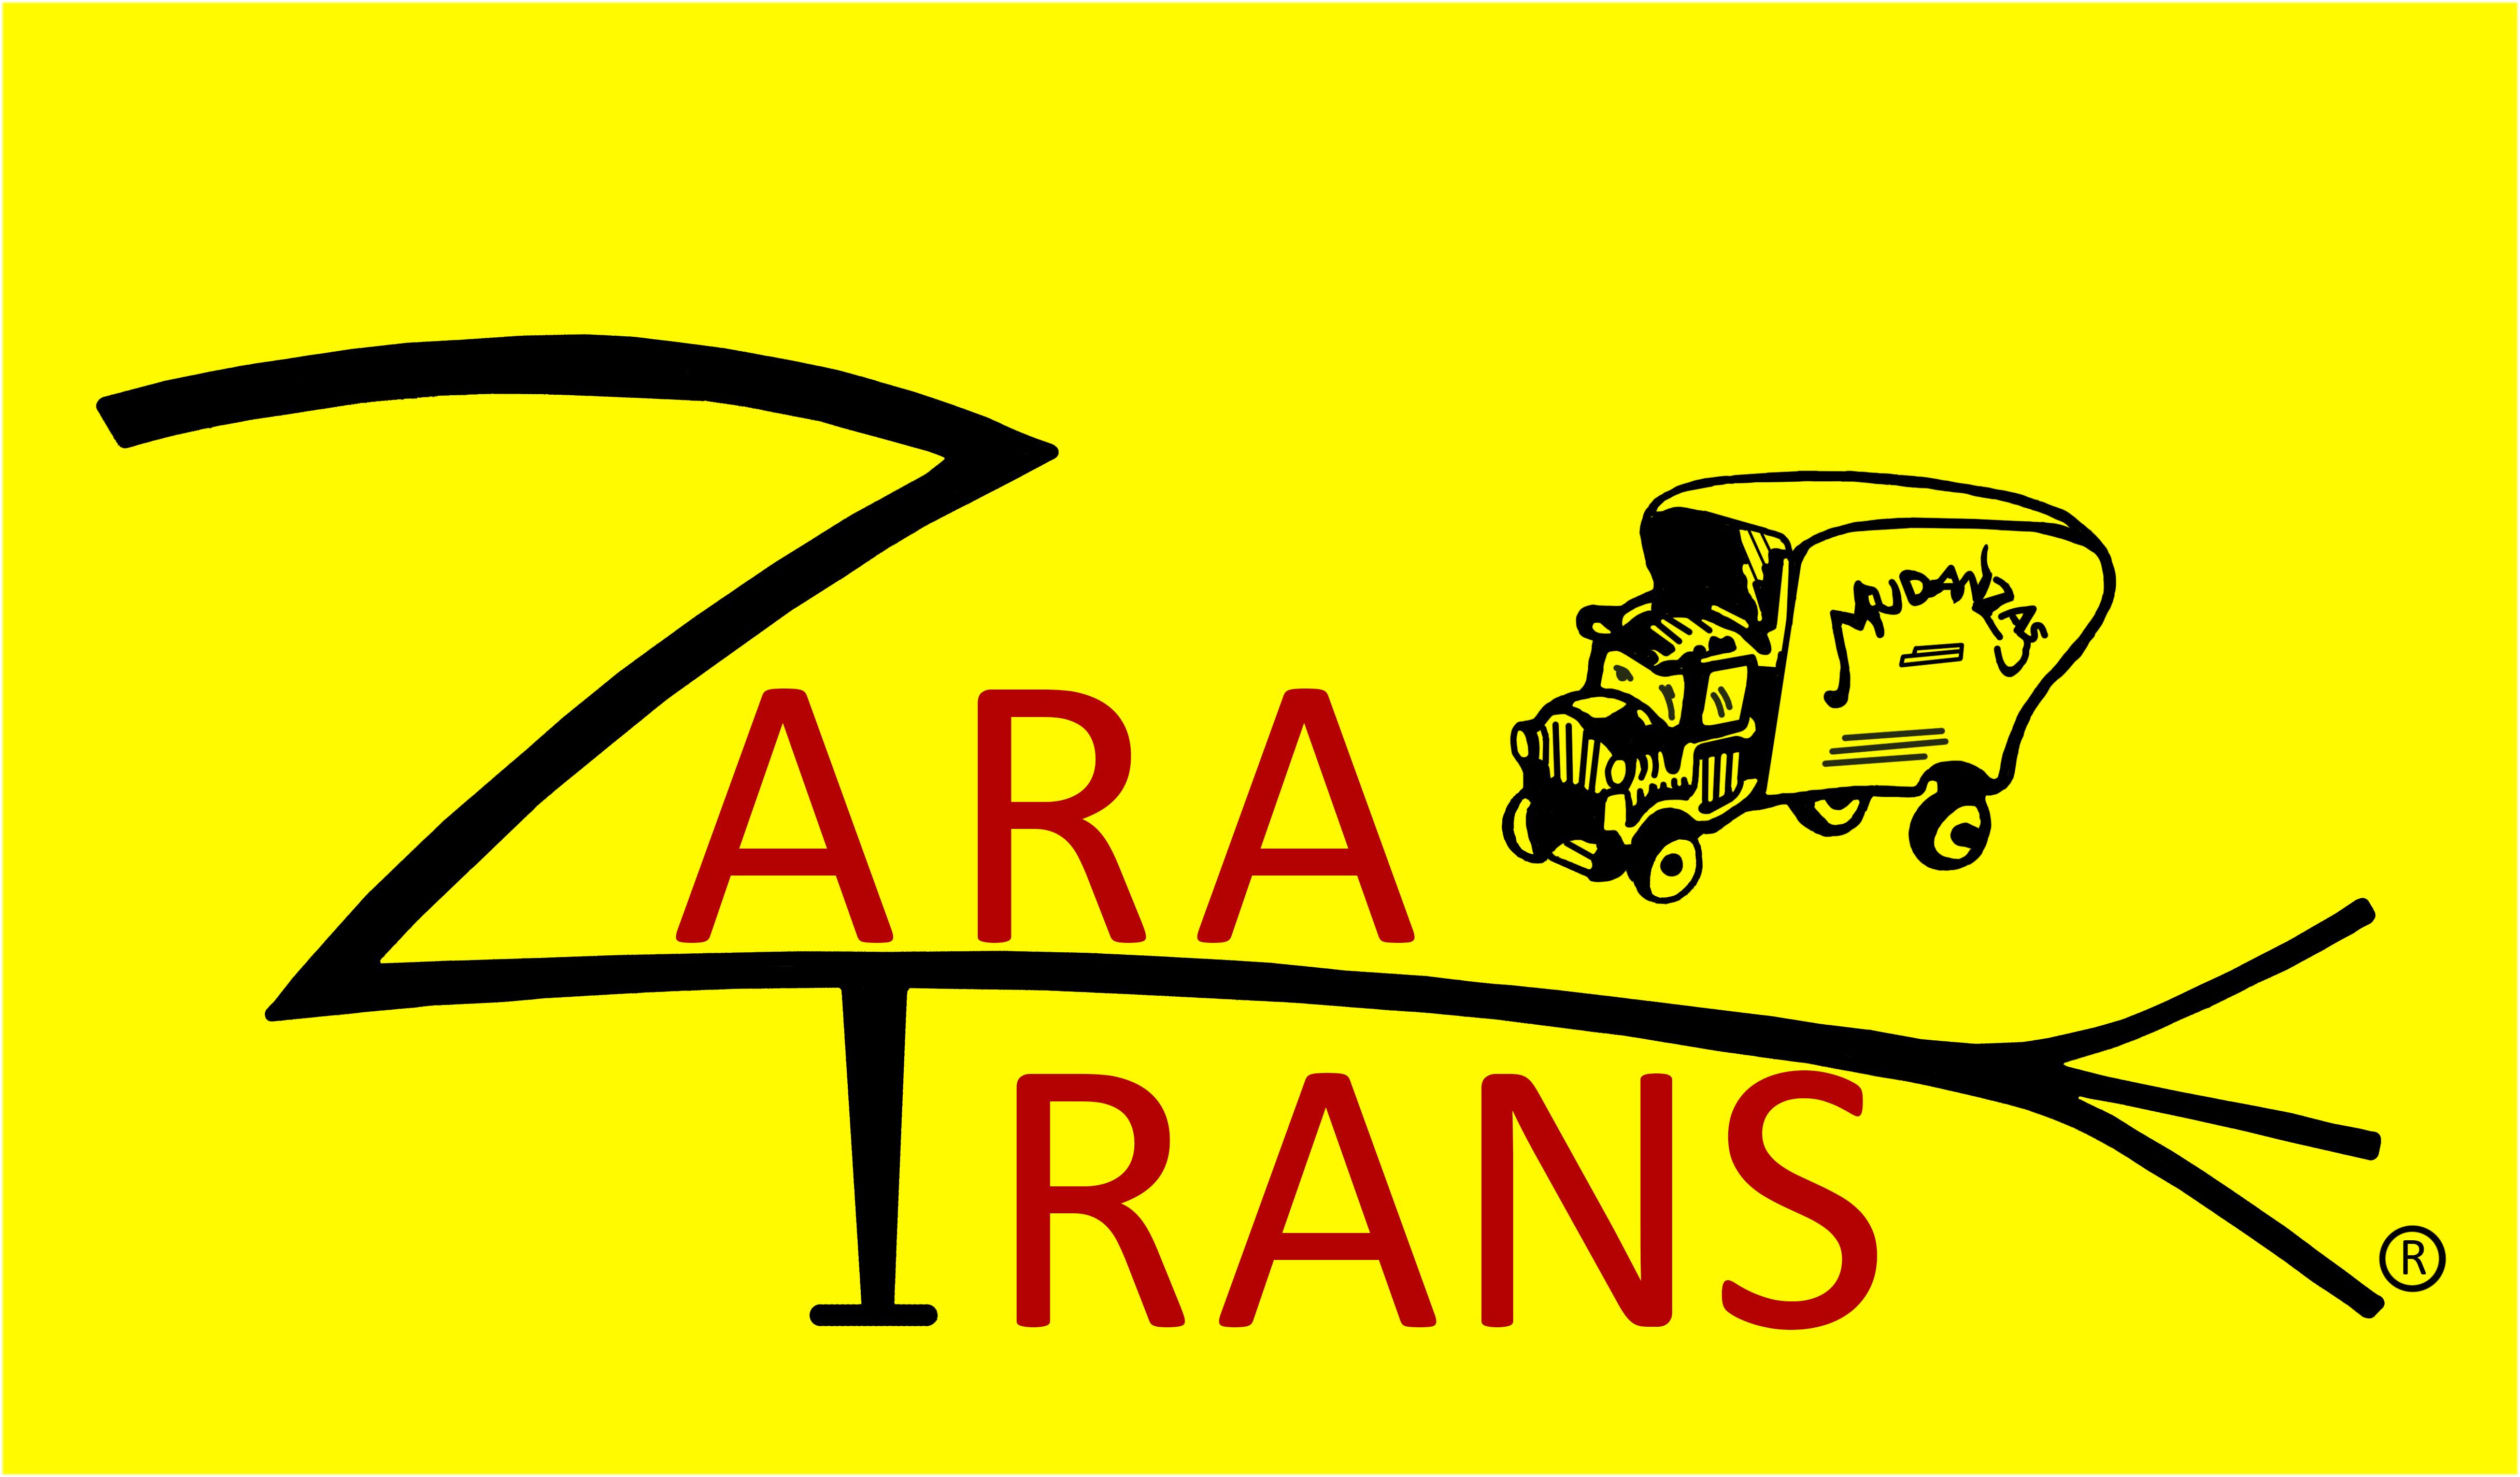 Mudanzas Zara Trans